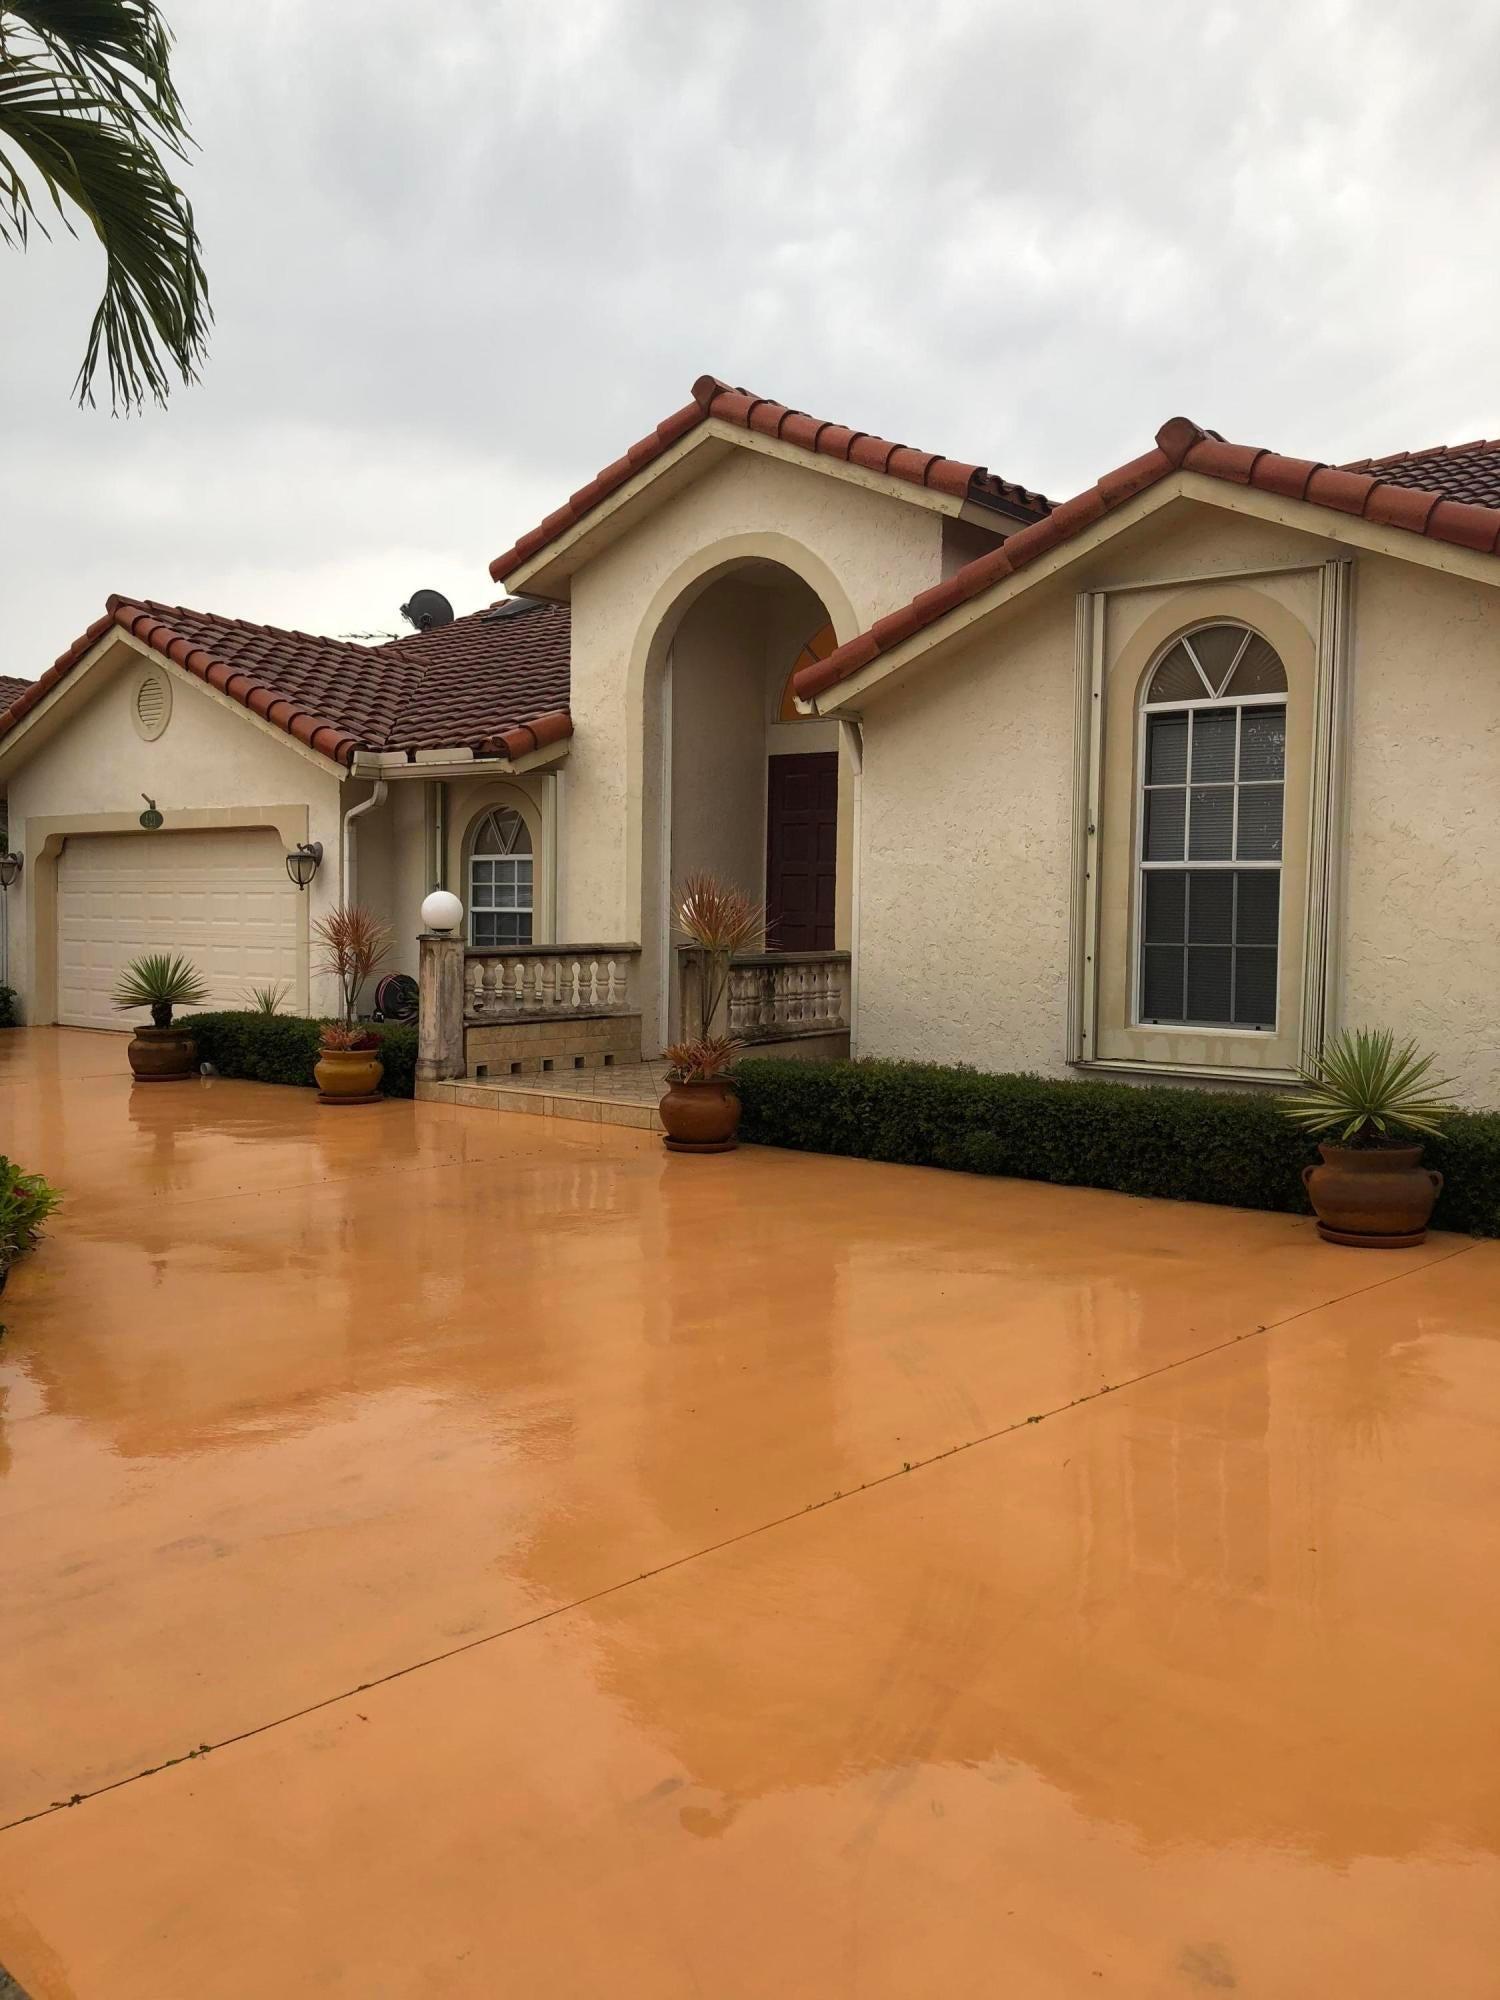 421 Cottonwood Lane  Boca Raton FL 33487